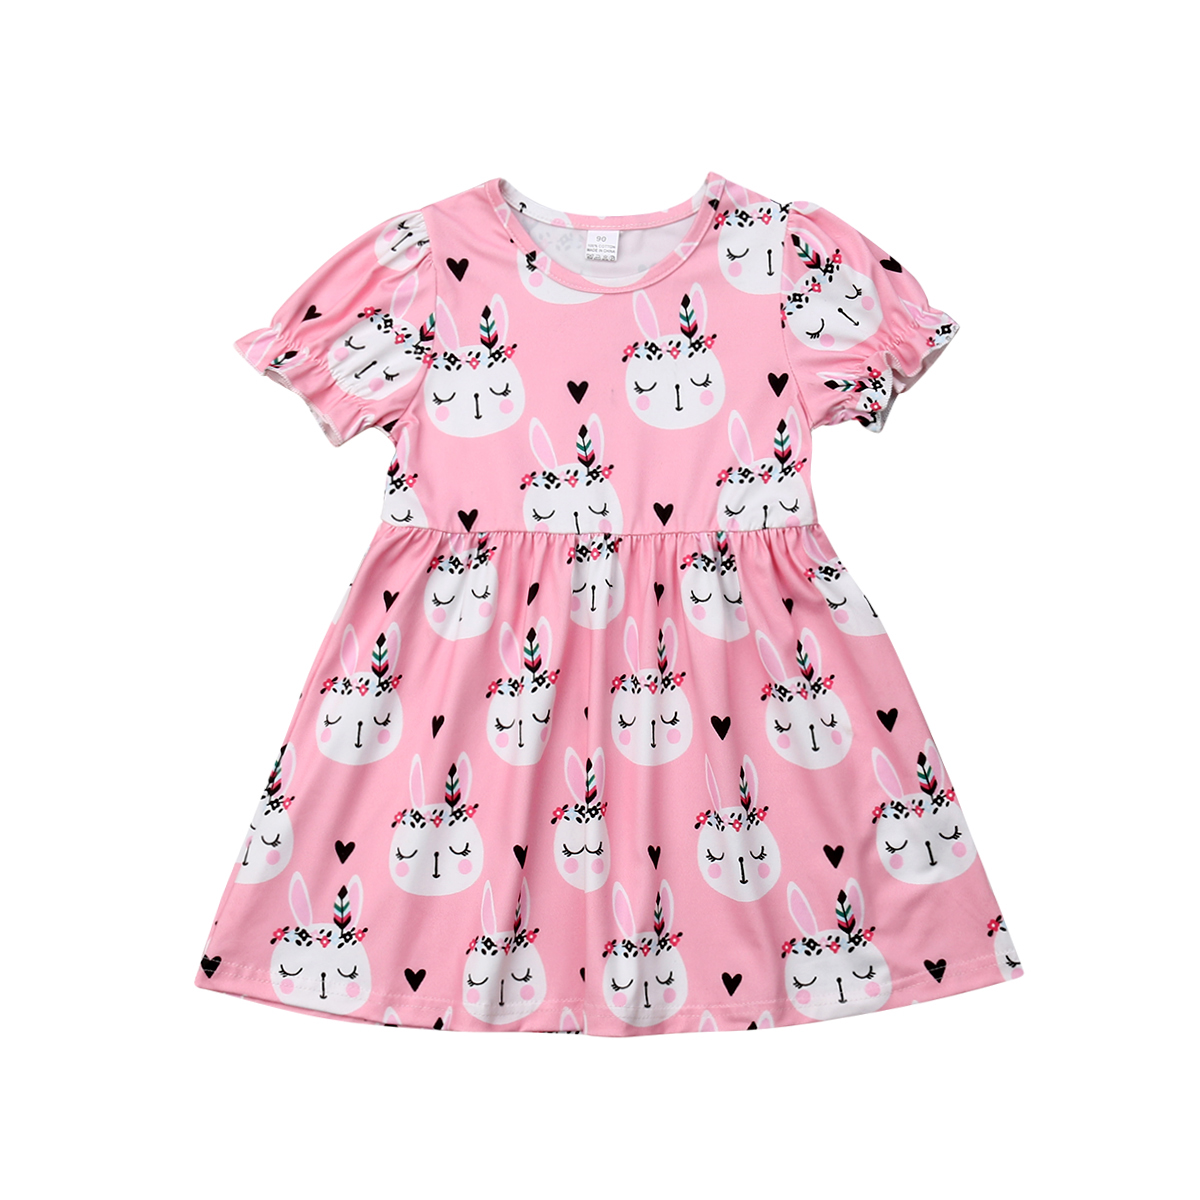 0d77d125e Pudcoco 2019 Summer Pink Toddler Girls Easter Dress Princess Bunny Print  Floral Dresses Cute Clothes